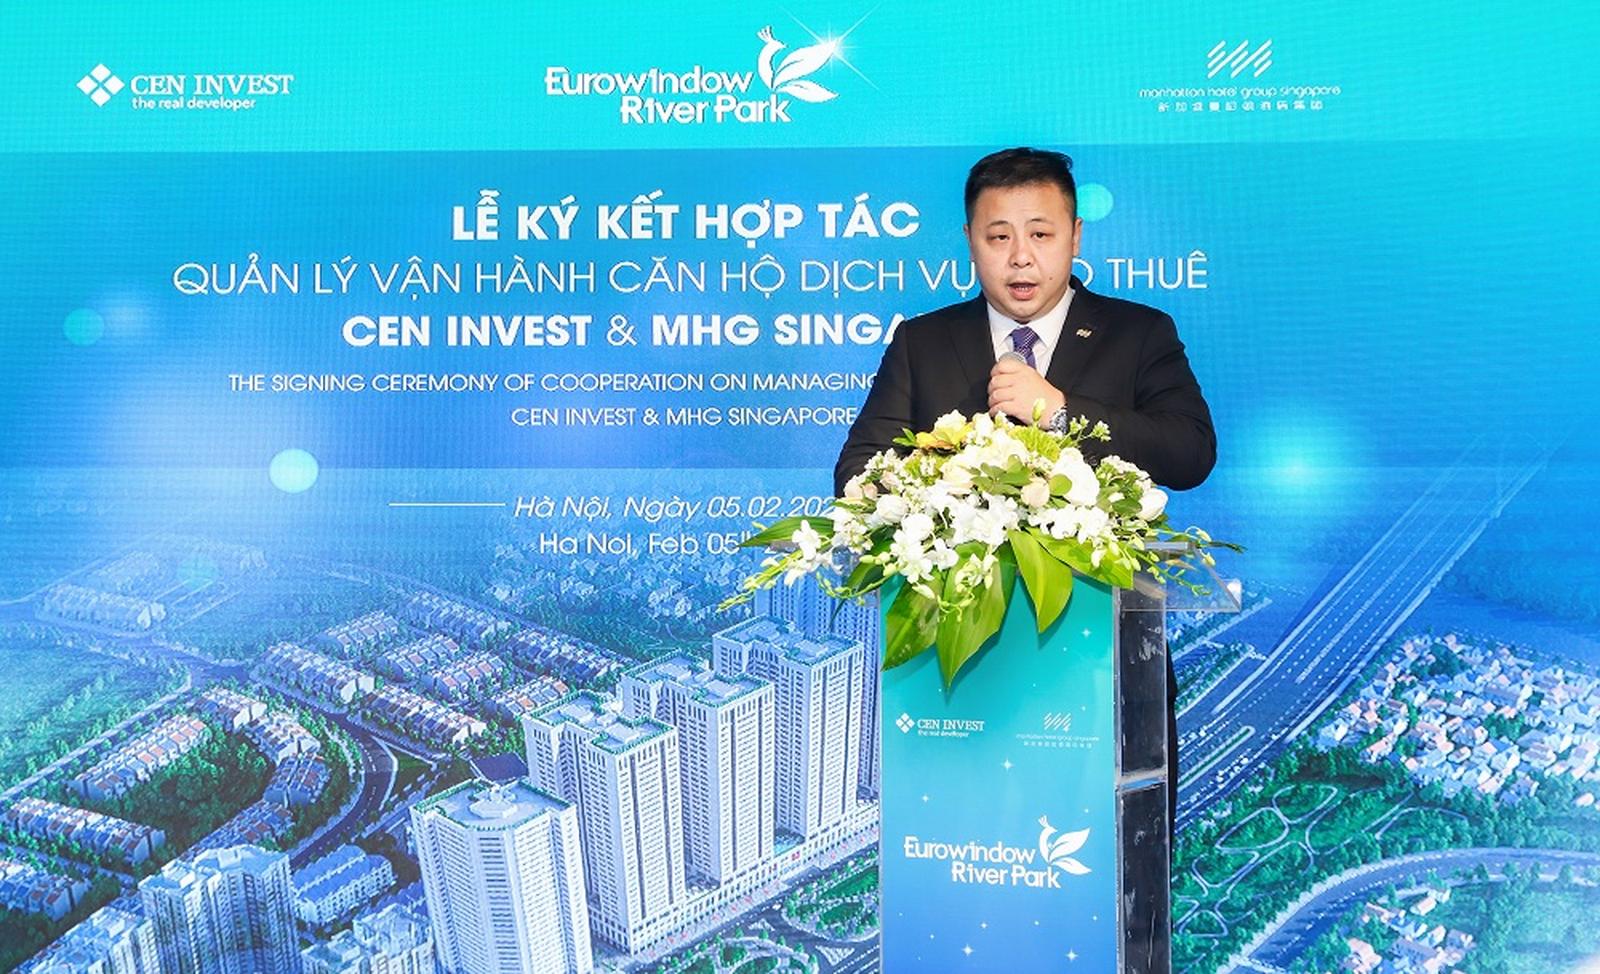 ceninvest va mhg singapore hop tac quan ly van hanh can ho cho thue euro river tower